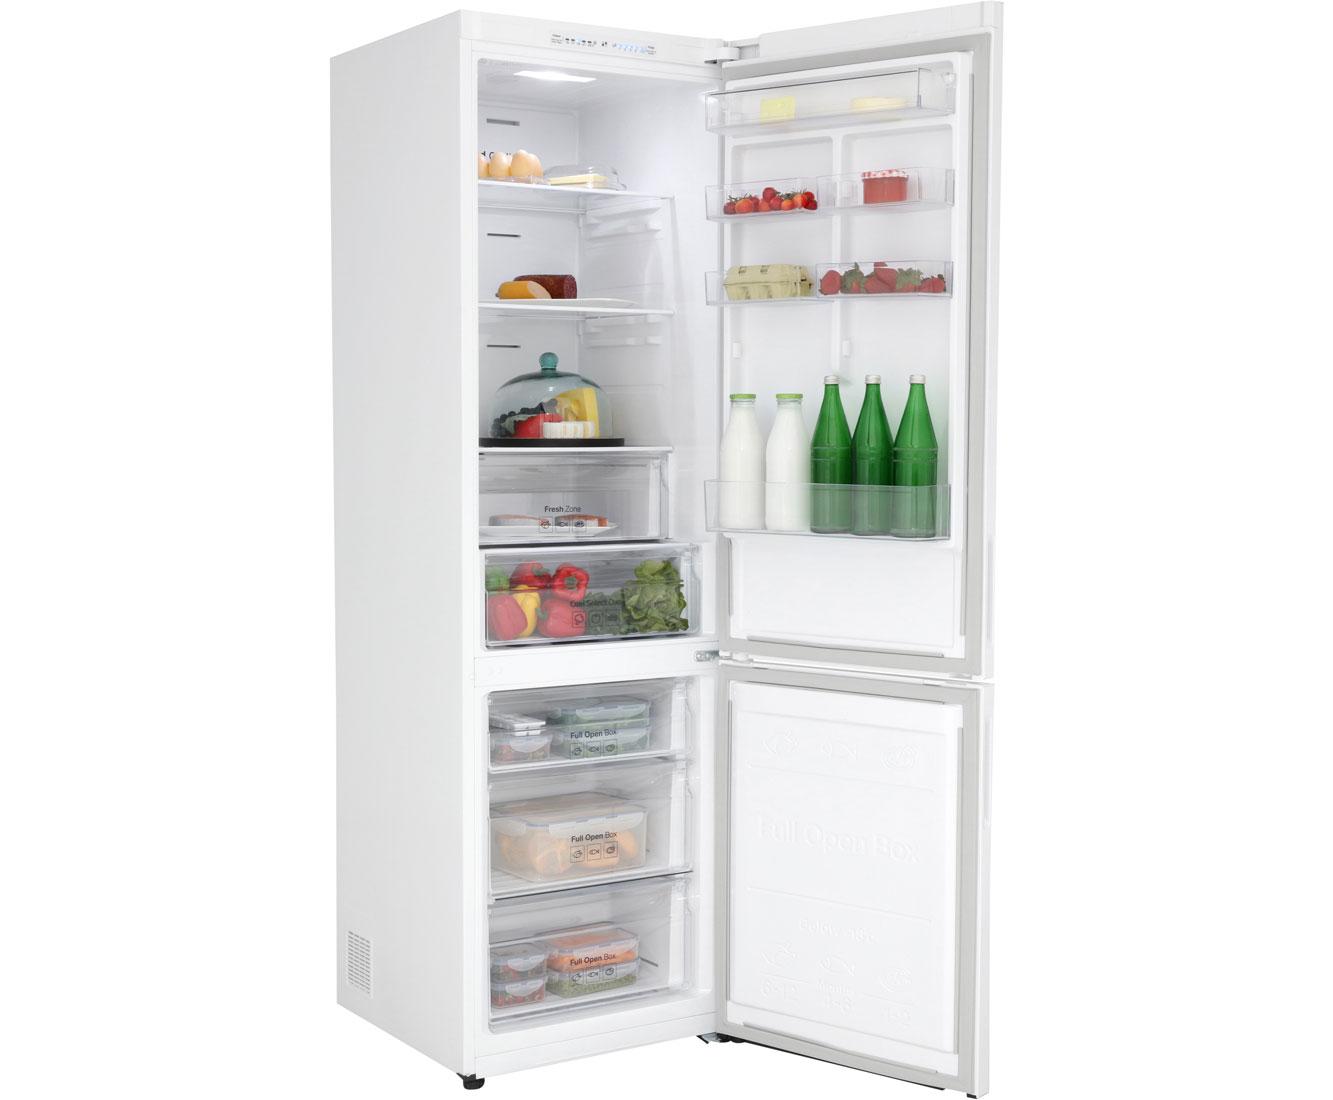 Bosch Kühlschrank 0 Grad Zone : Kühl gefrierkombination samsung rb j msa a l kühlen